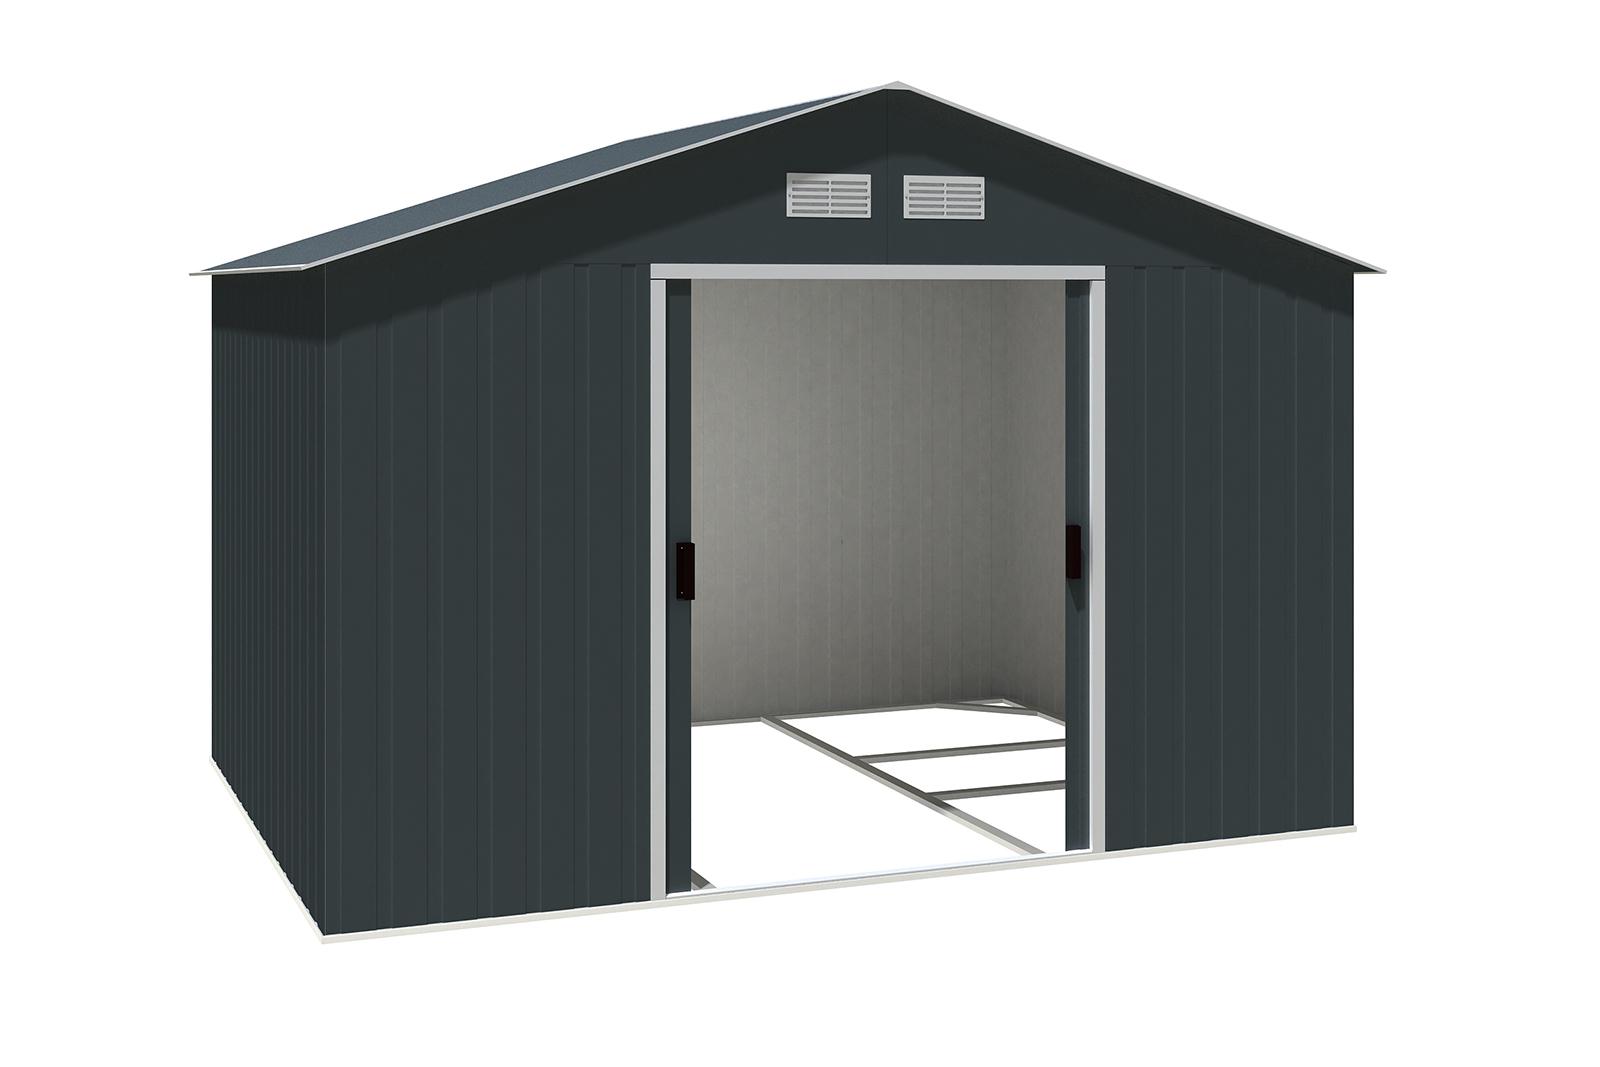 metallger tehaus colossus 10x8 anthrazit 7246. Black Bedroom Furniture Sets. Home Design Ideas